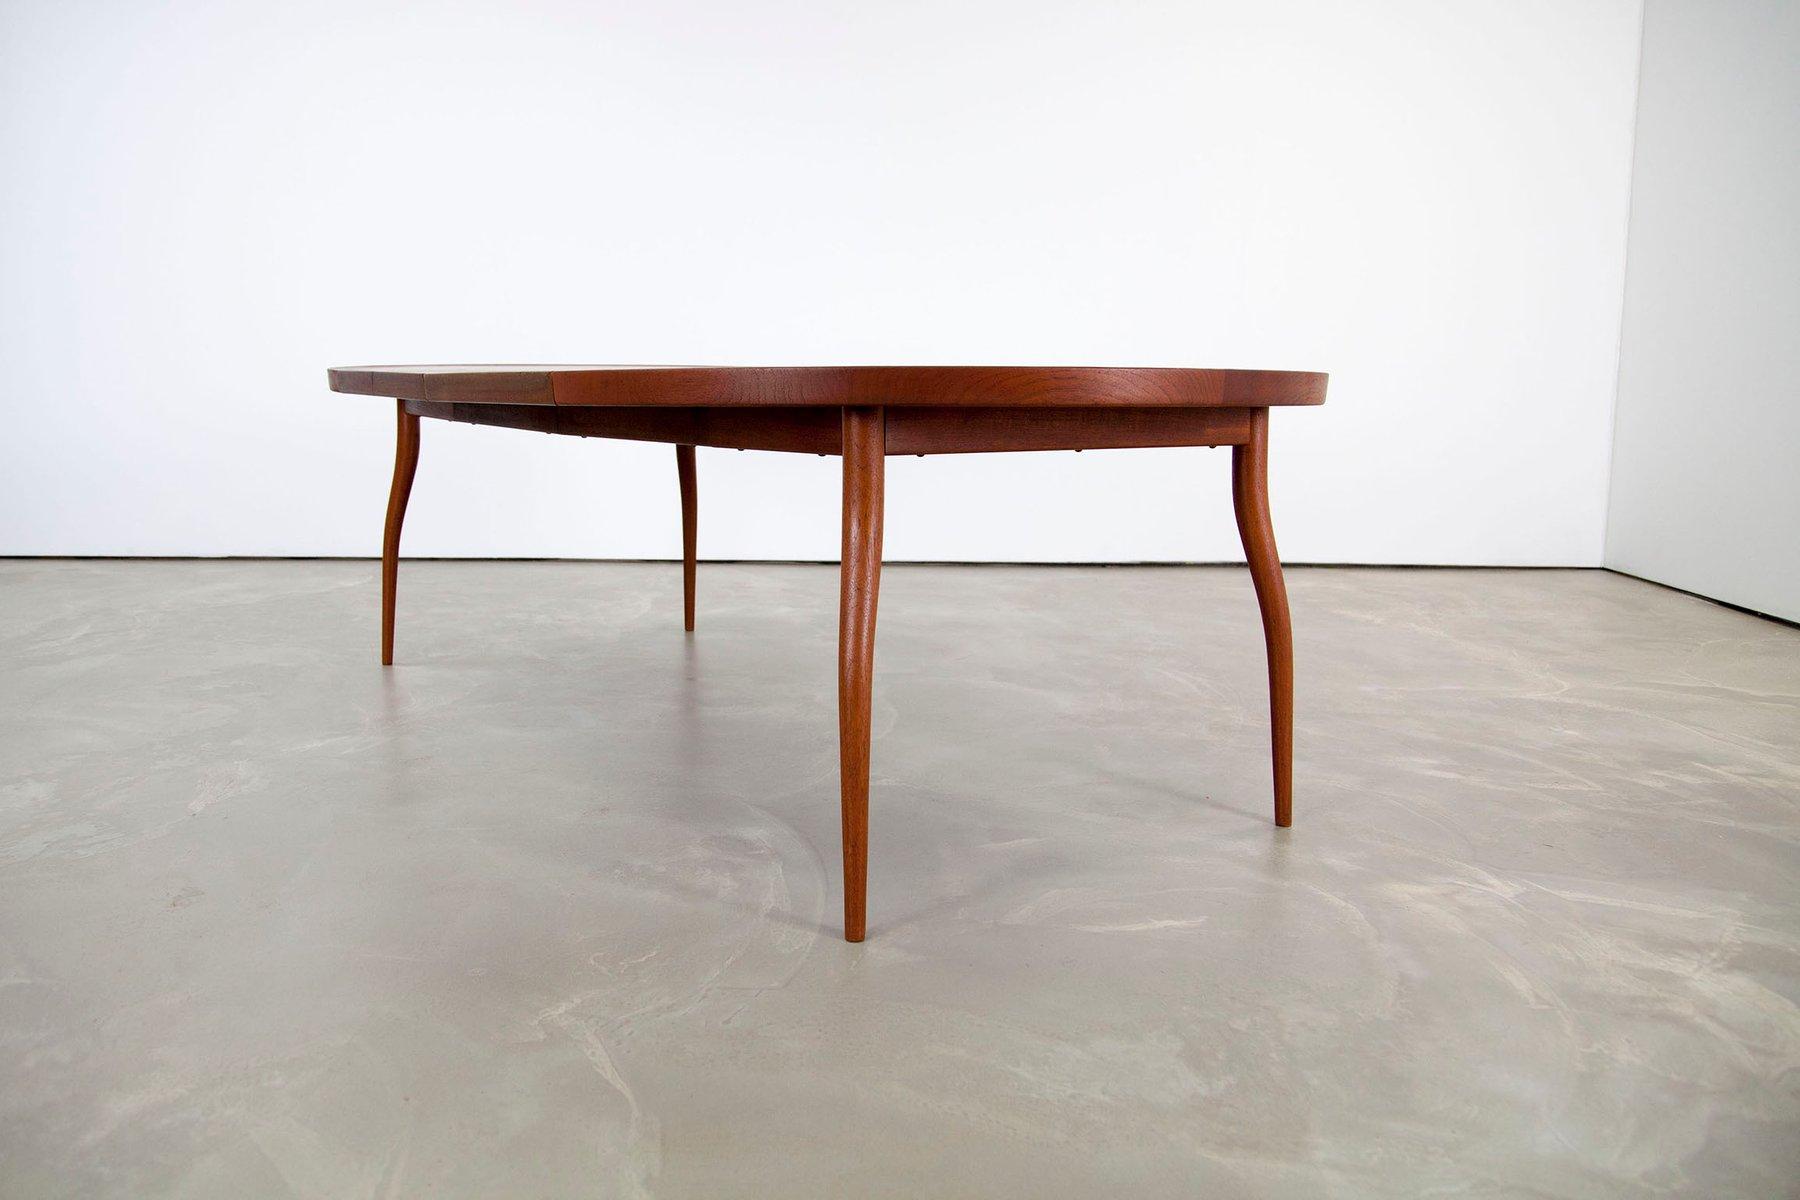 table de salle manger nv56 en teck par finn juhl pour nils vodder 1956 en vente sur pamono. Black Bedroom Furniture Sets. Home Design Ideas